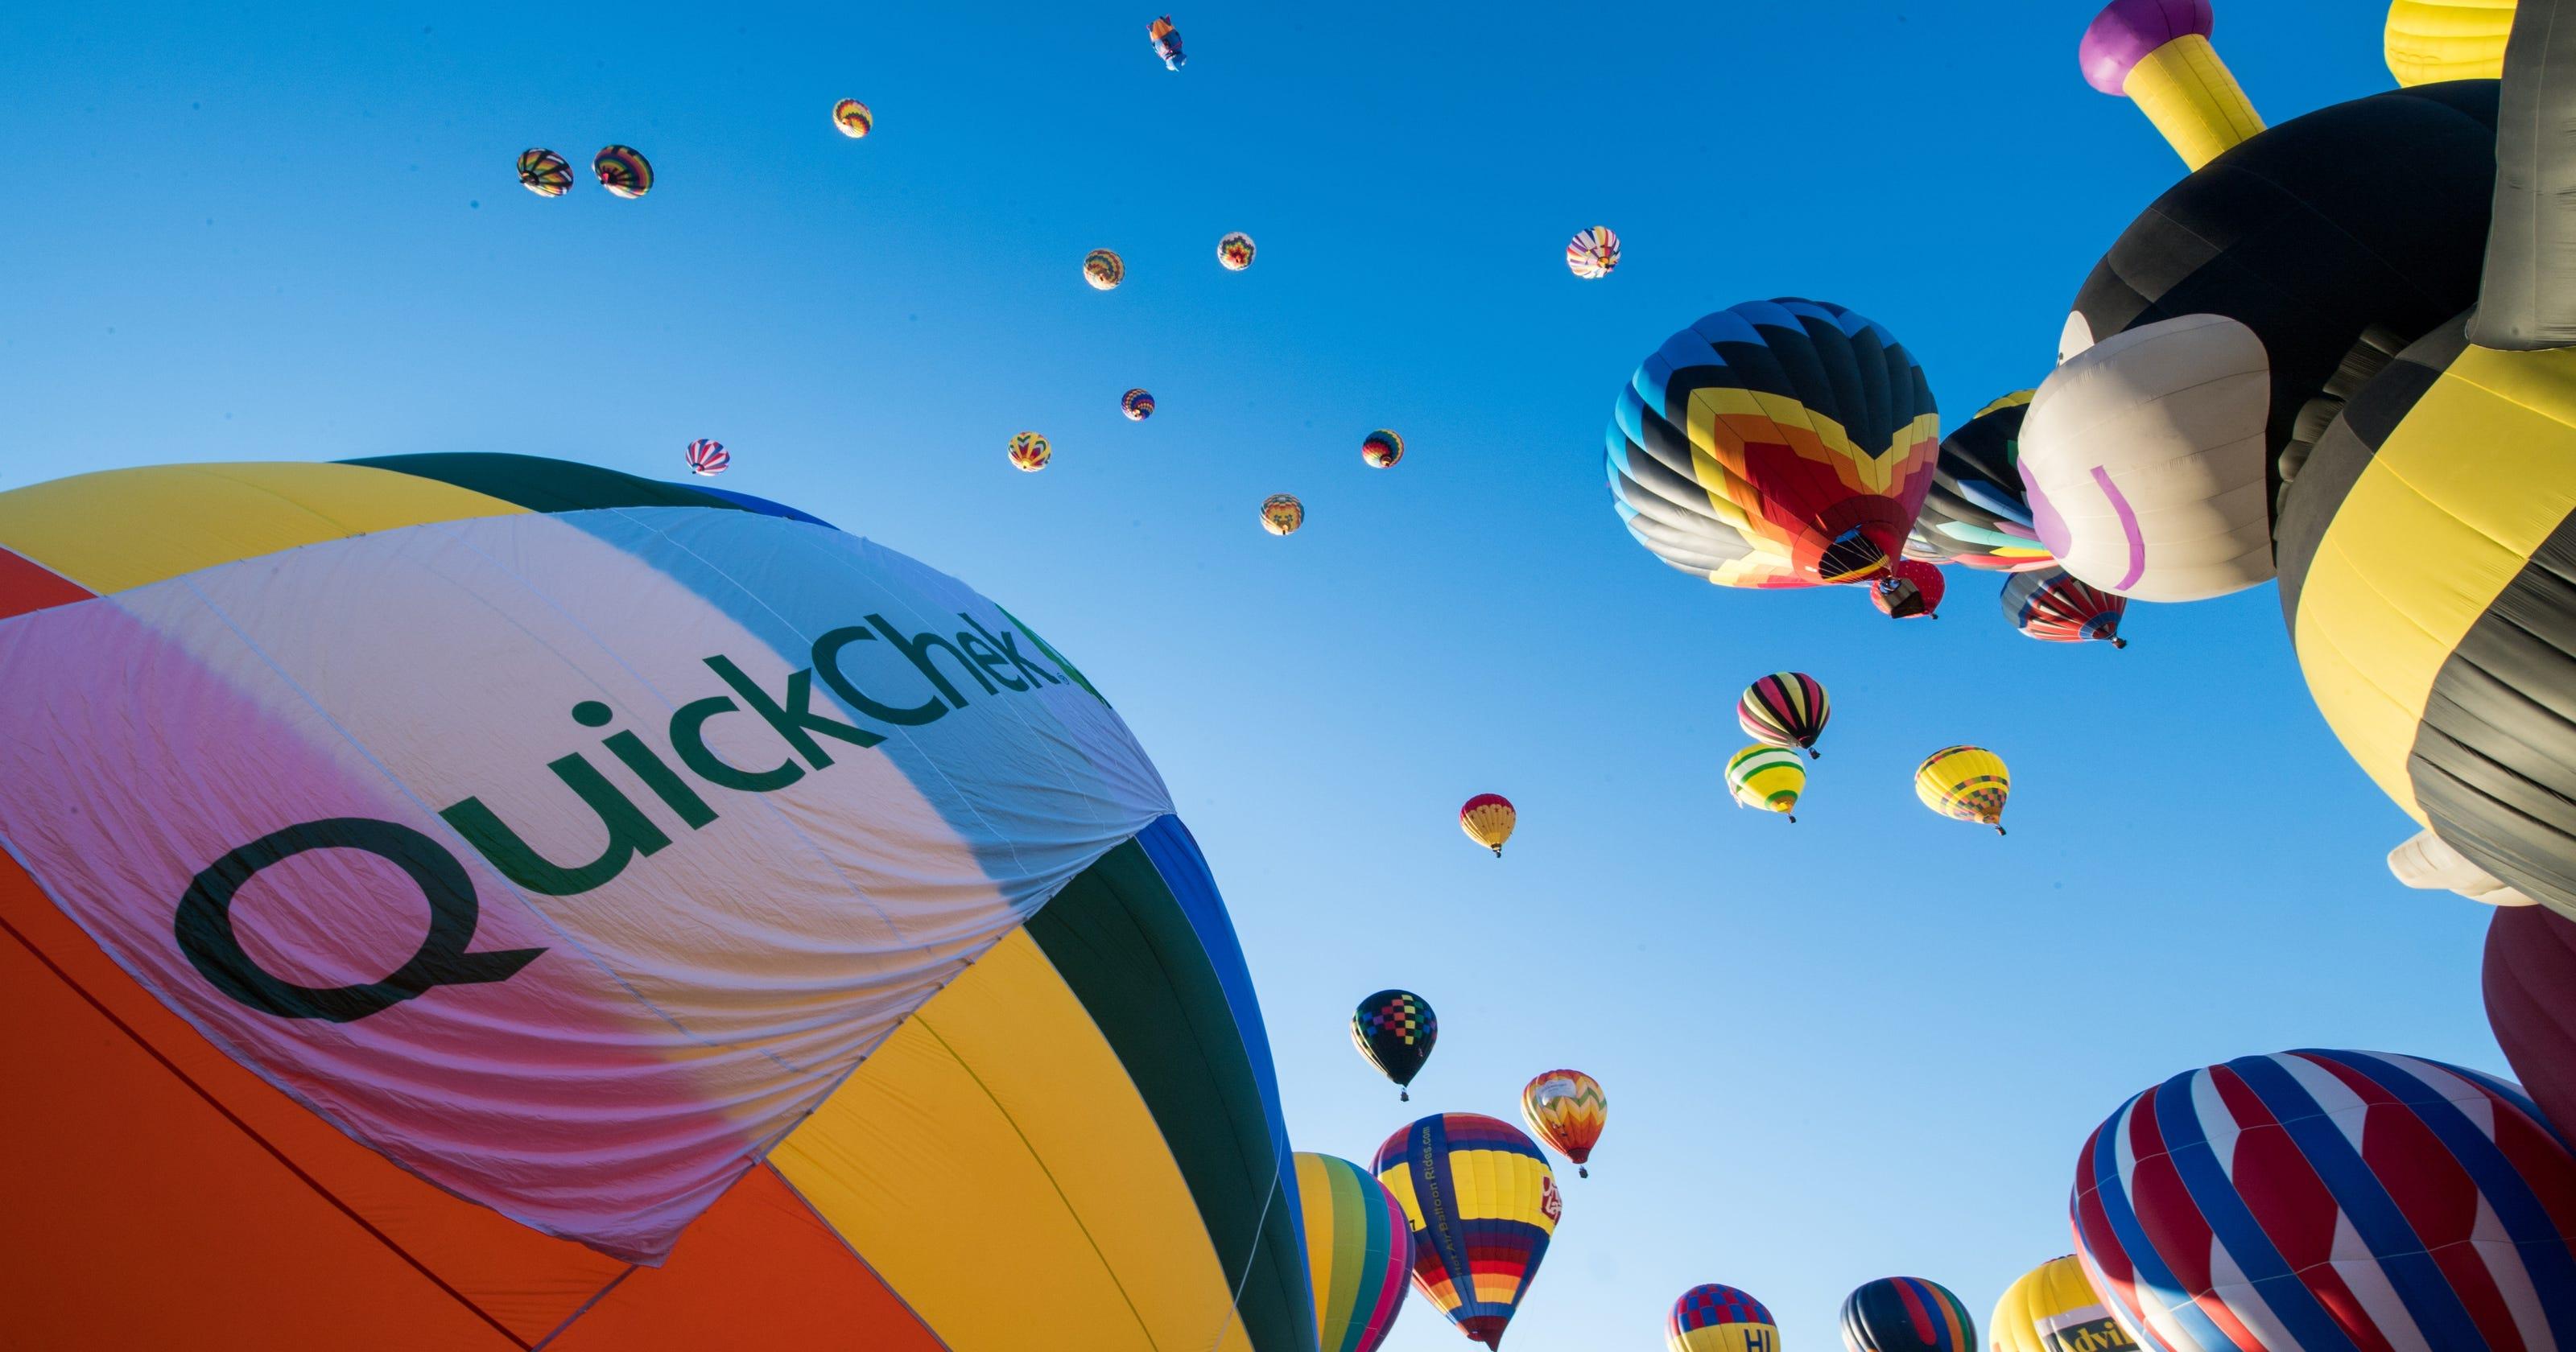 Balloon Festival 2020 Nj.Quickchek Balloon Festival 2020 Festival 2020